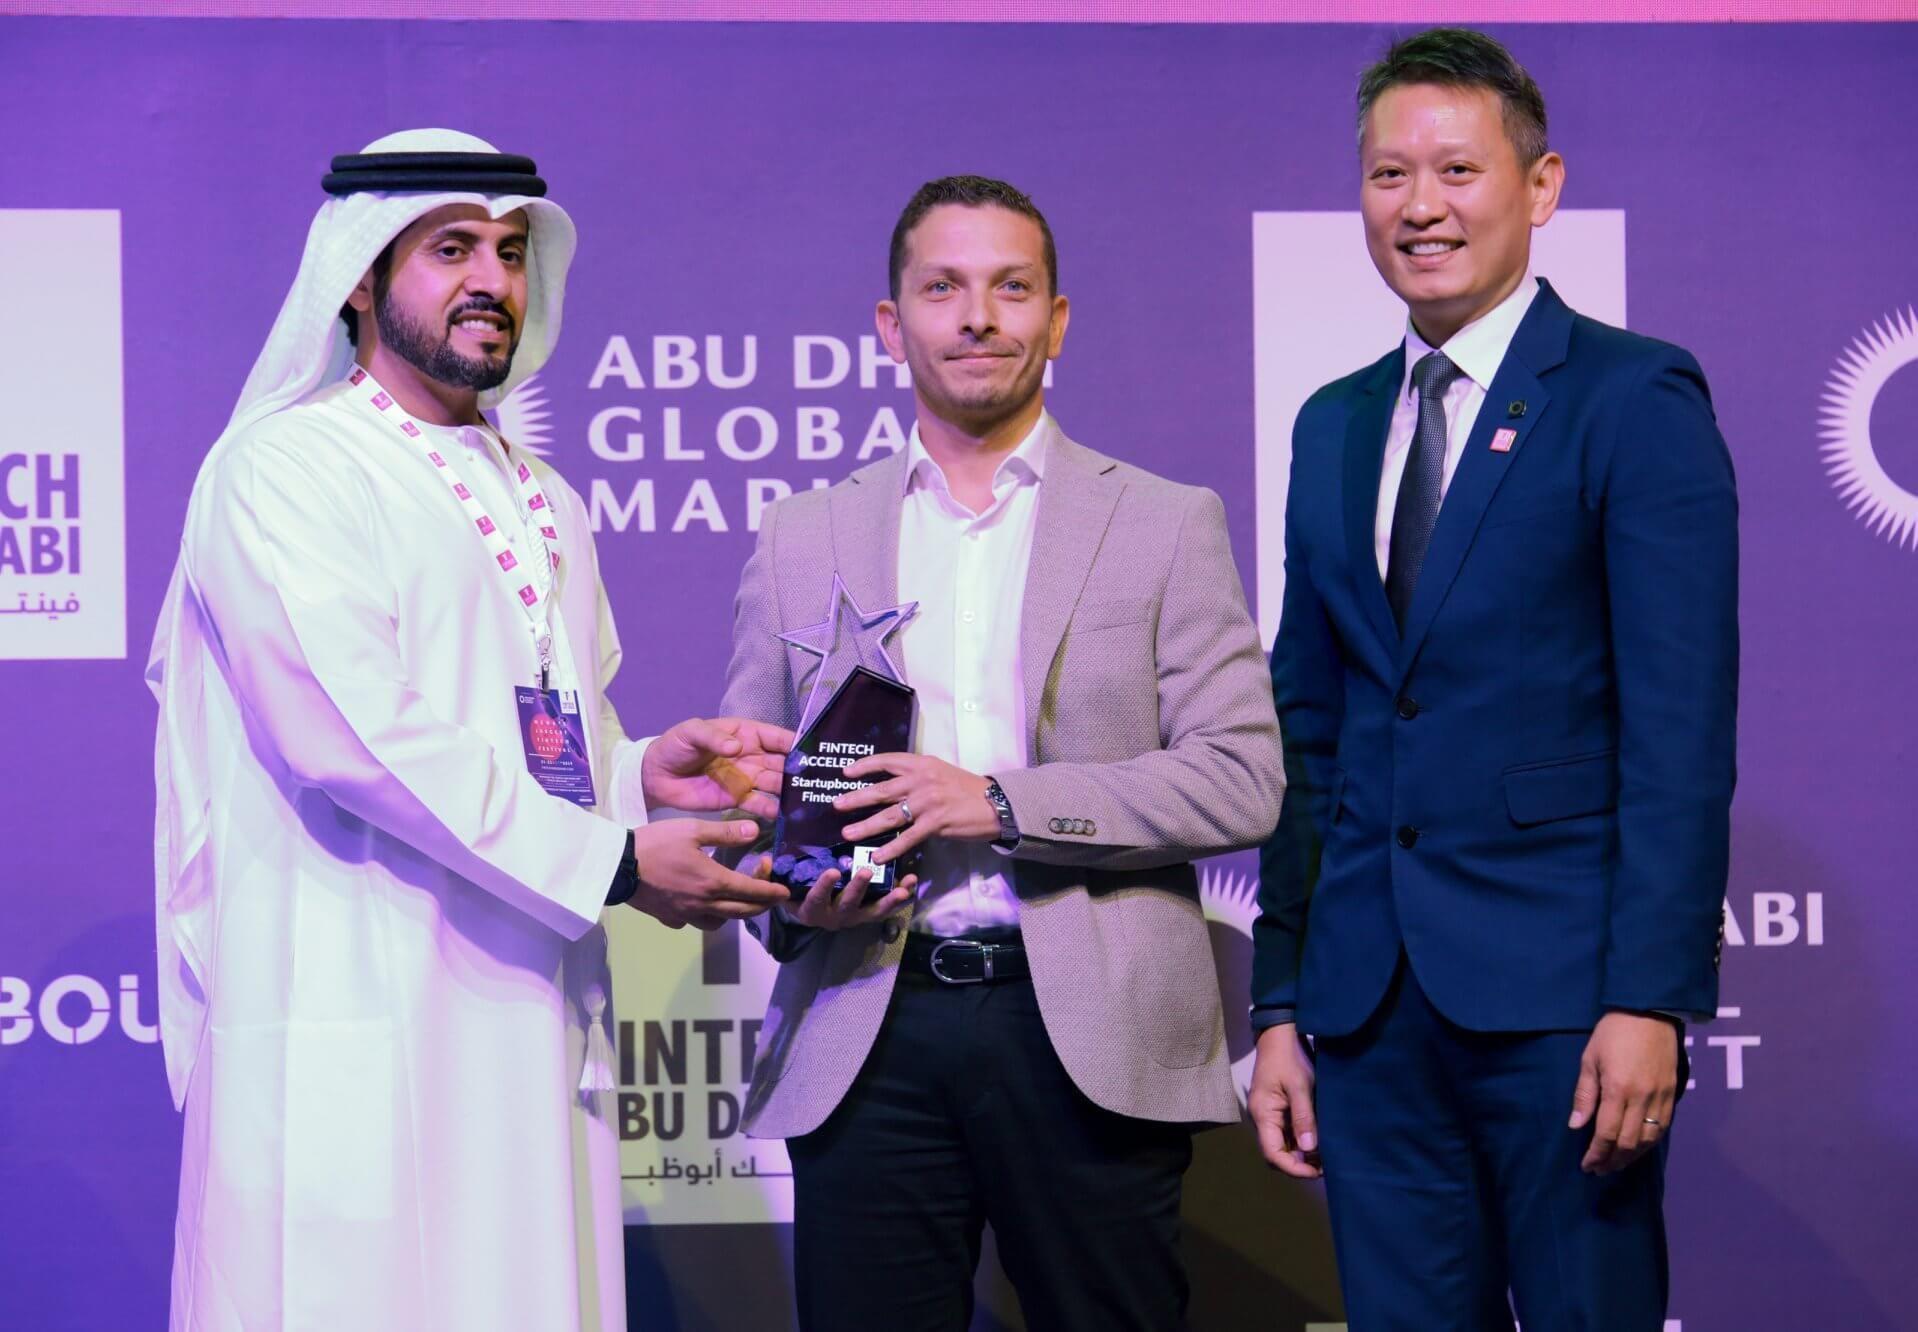 FinTech Abu Dhabi Award Winner Startup Bootcamp 2019